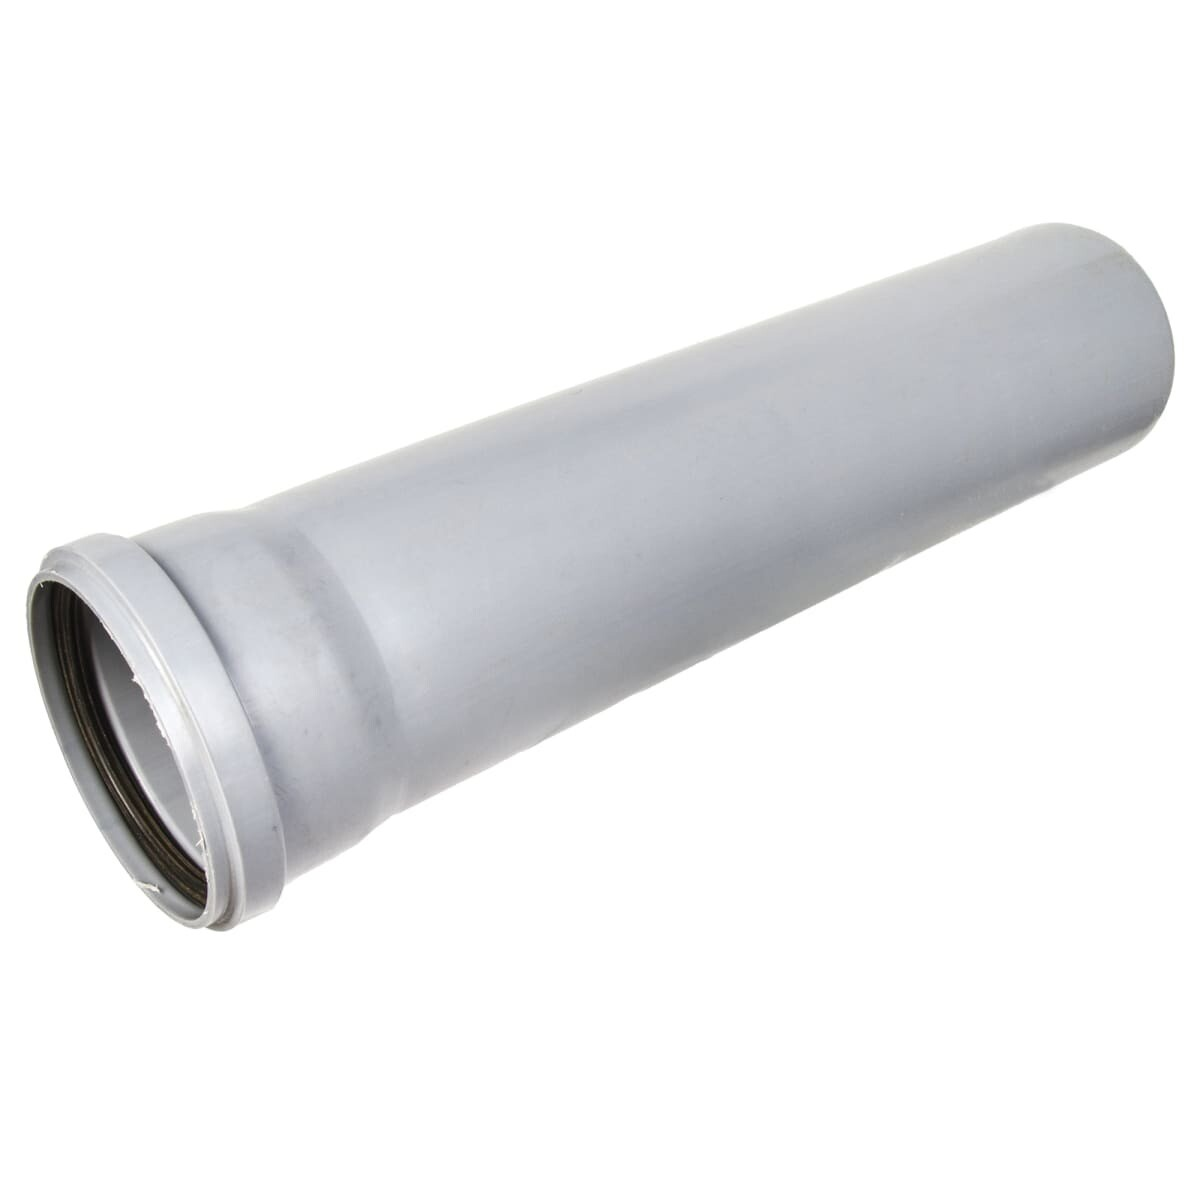 110 труба 0,5 м